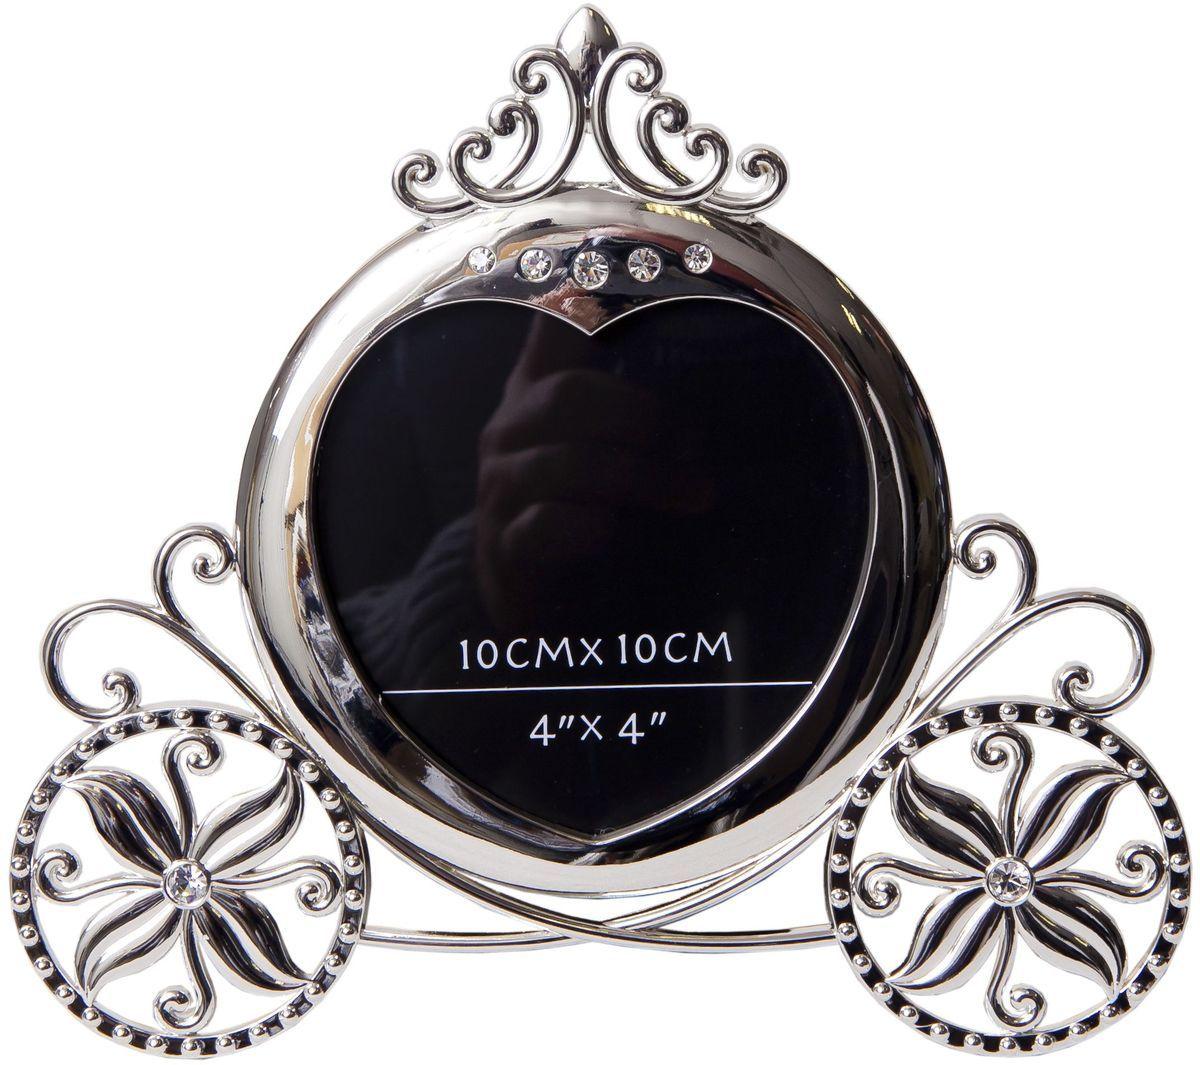 Фоторамка декоративная Platinum Карета, 10 х 10 см. PF9873-4PLATINUM PF9873-4